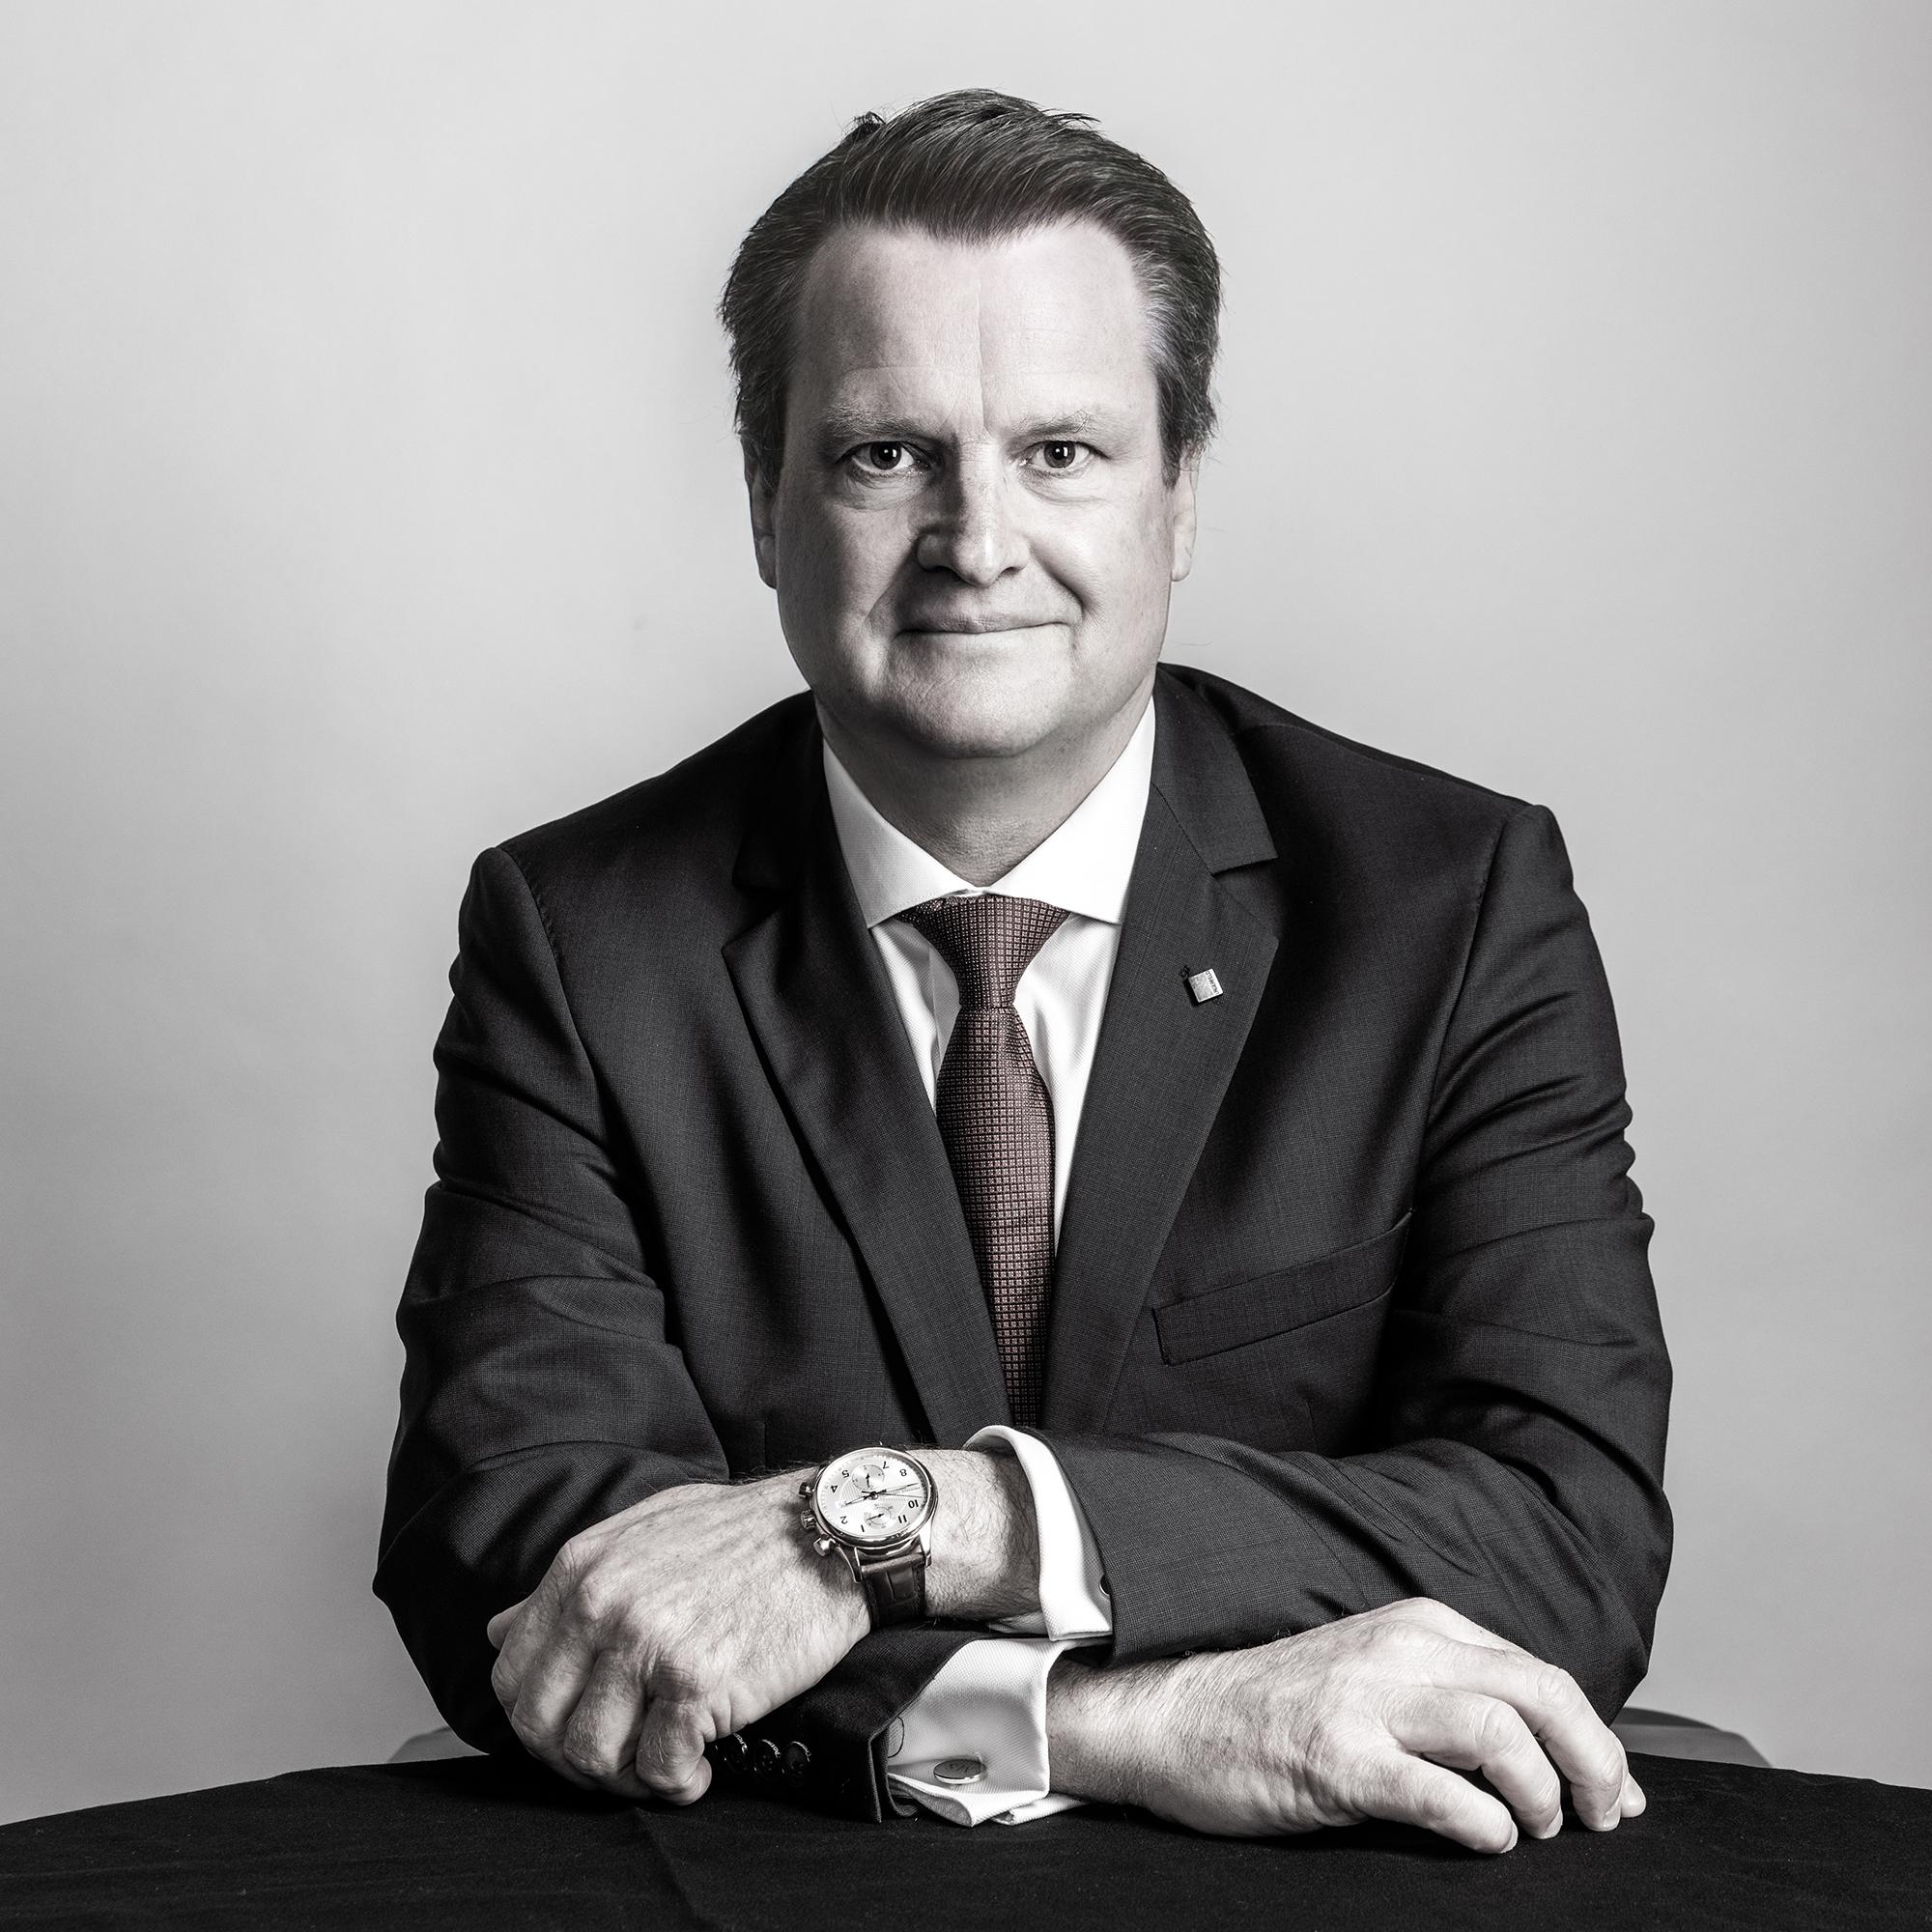 profile image of Mark